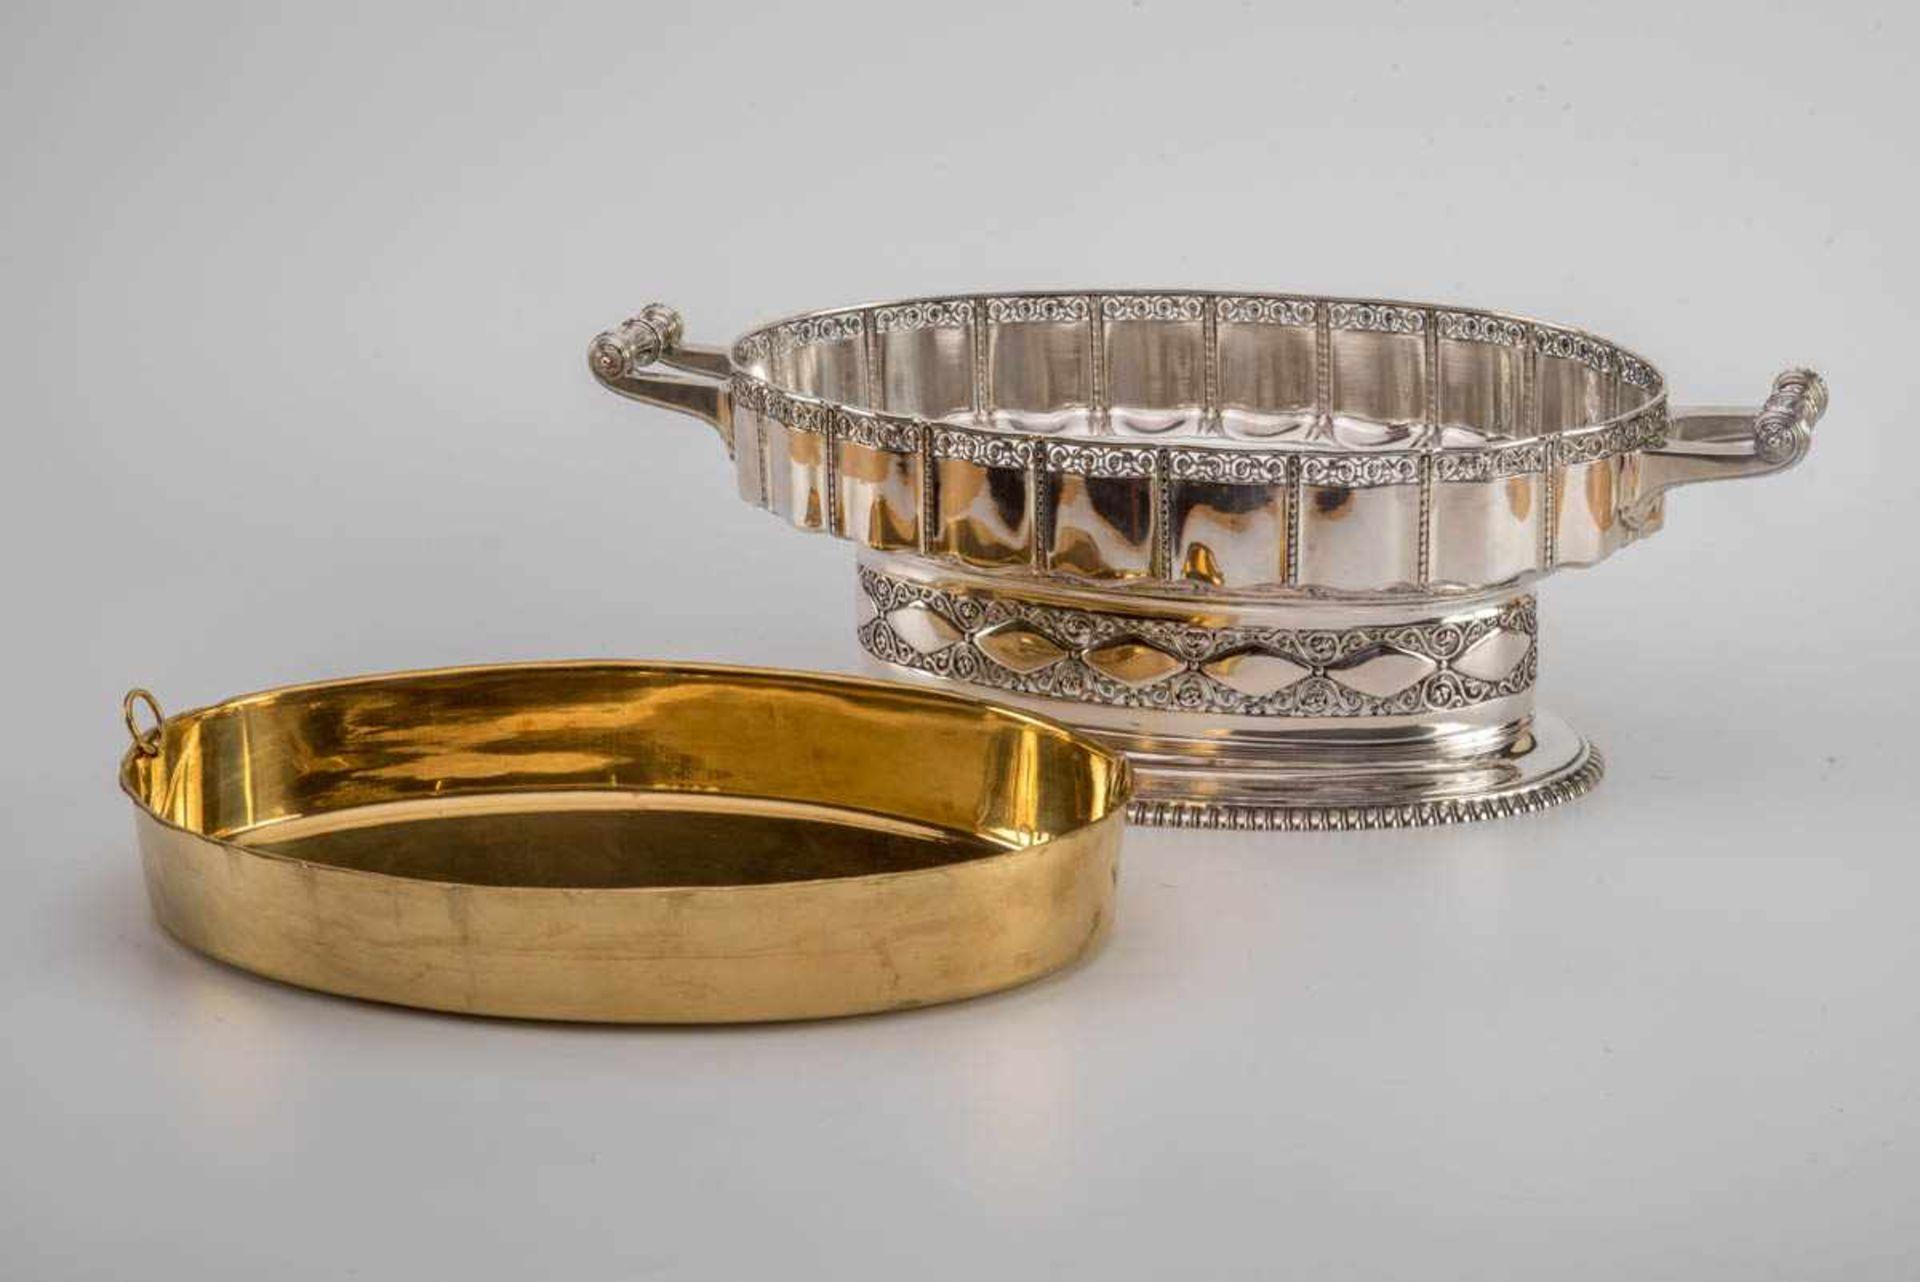 Los 23 - Jardiniere, Peter Bruckmann, Heilbronn um 1920 800er Silber, vergoldeter Messingeinsatz. Ovaler